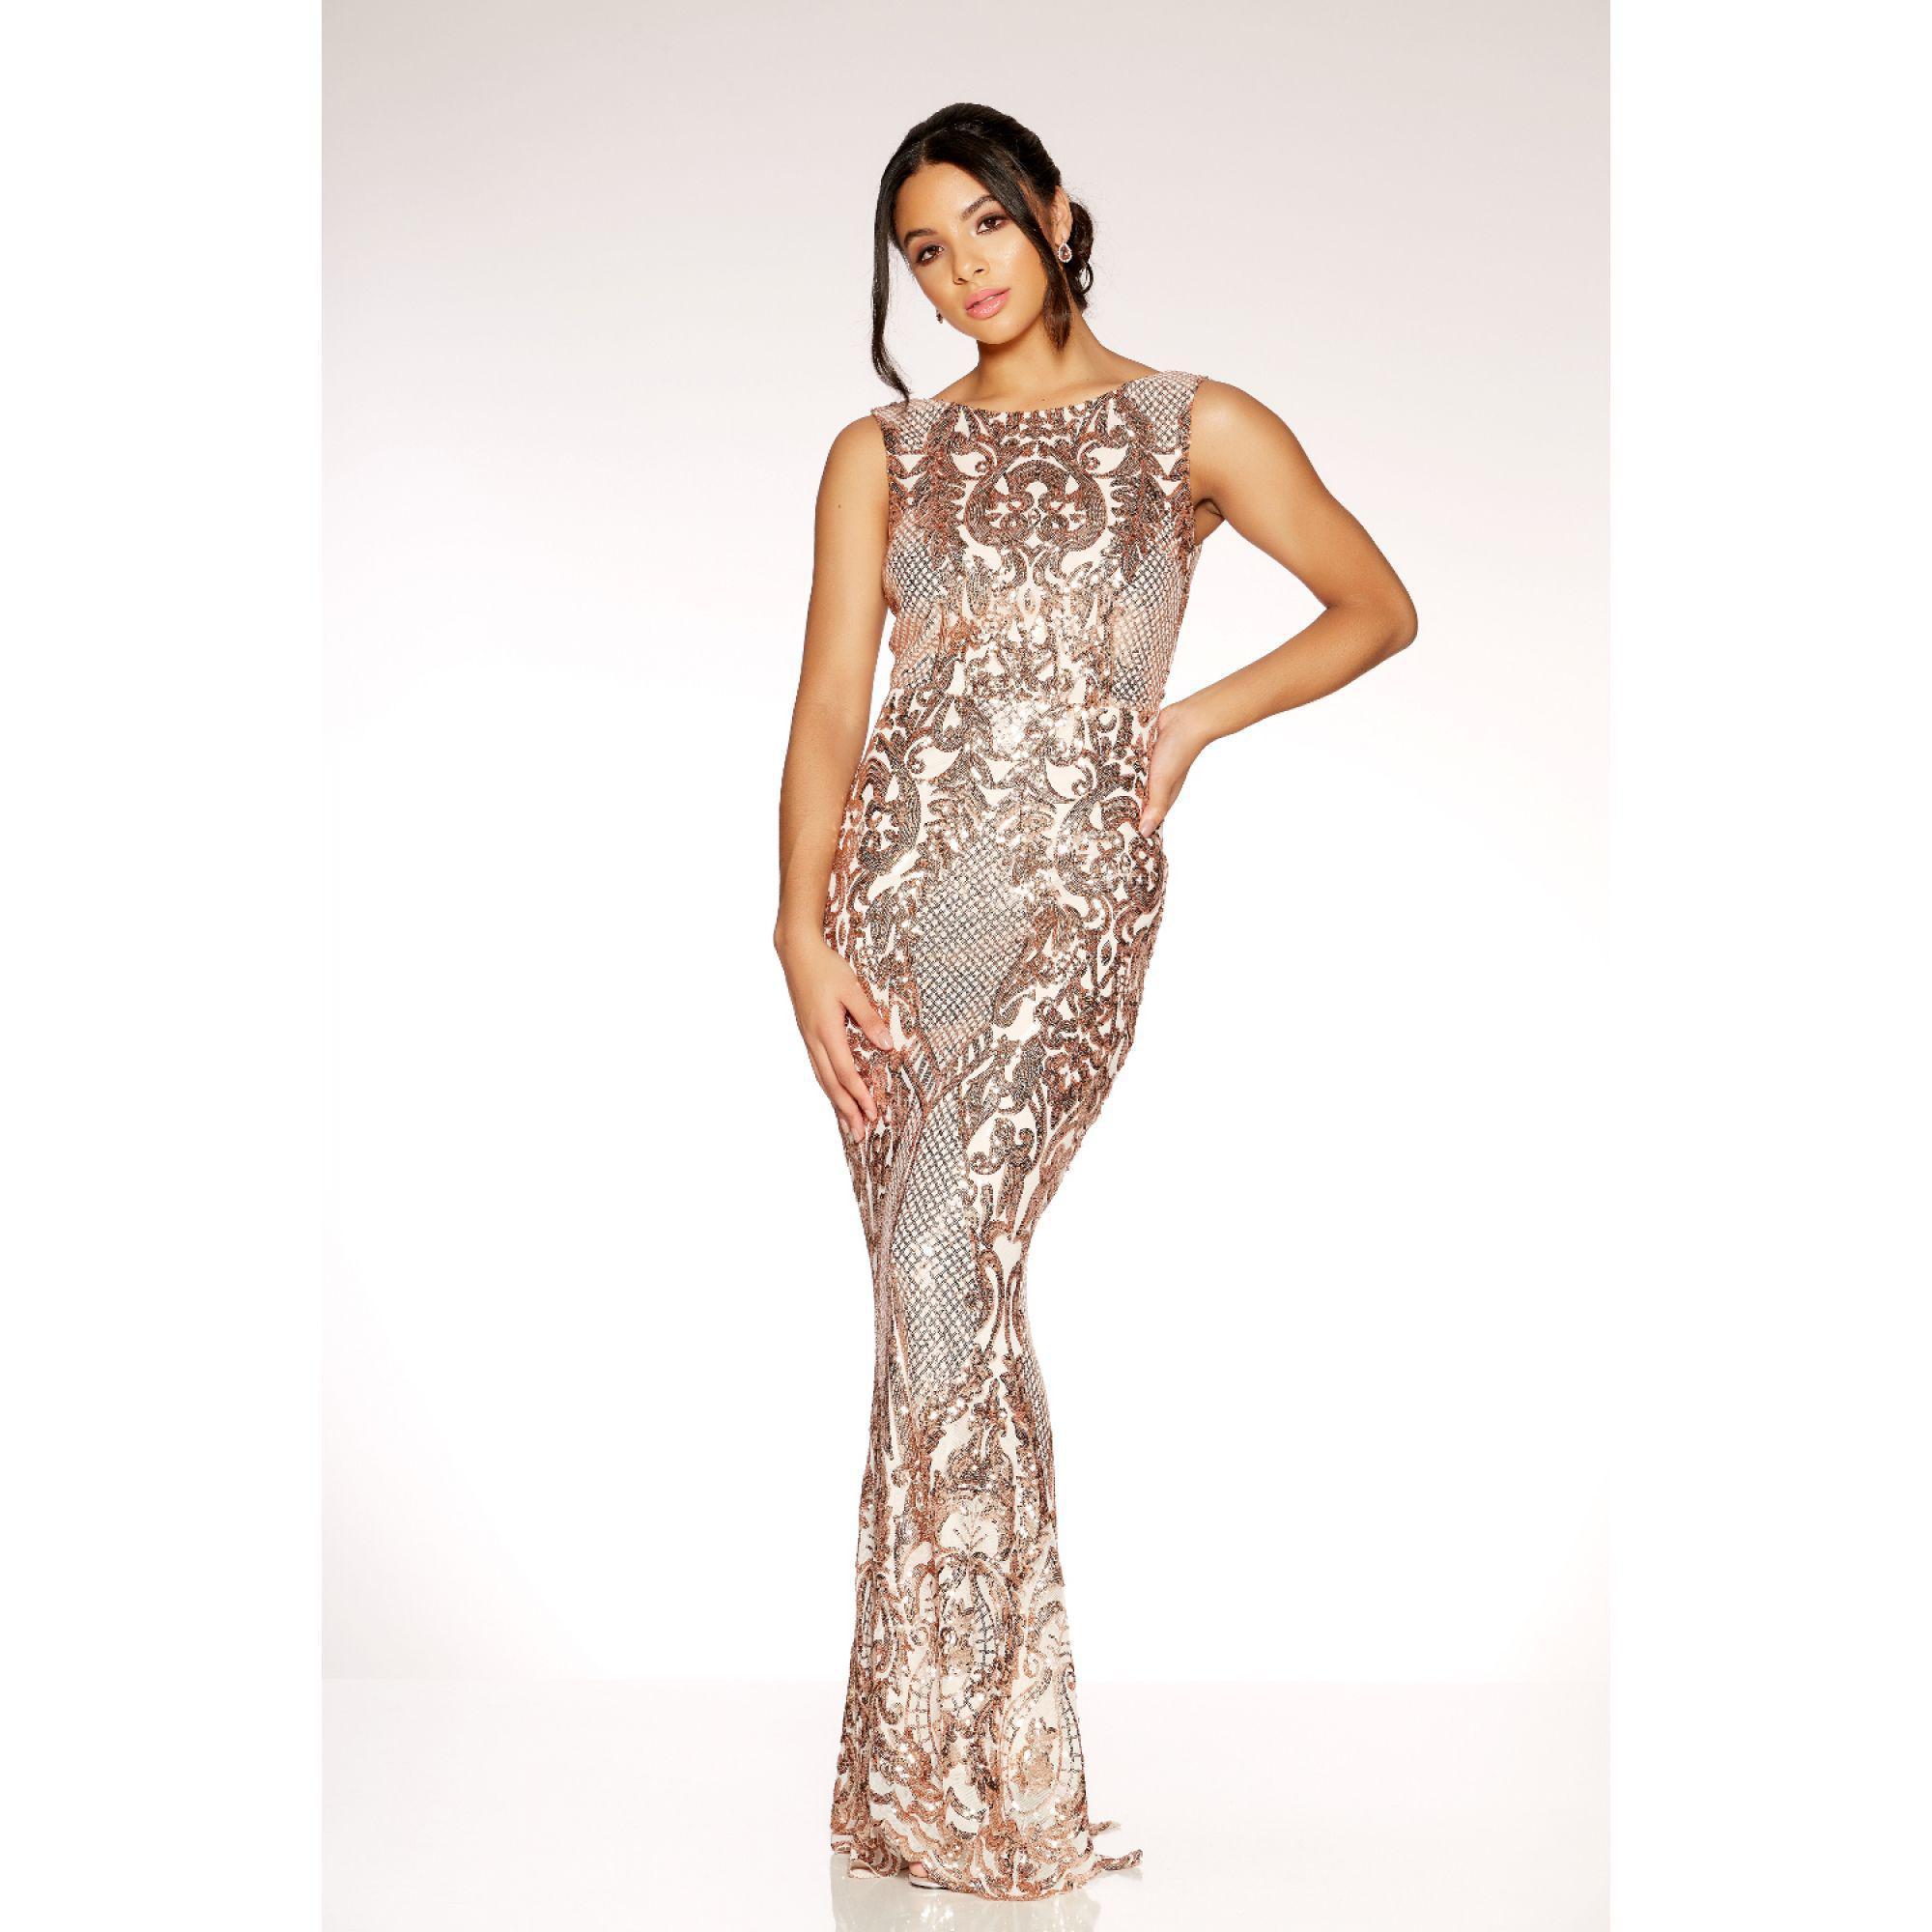 a9ebfbafaf Quiz Rose Gold Sequin Mesh High Neck Fishtail Maxi Dress In Metallic